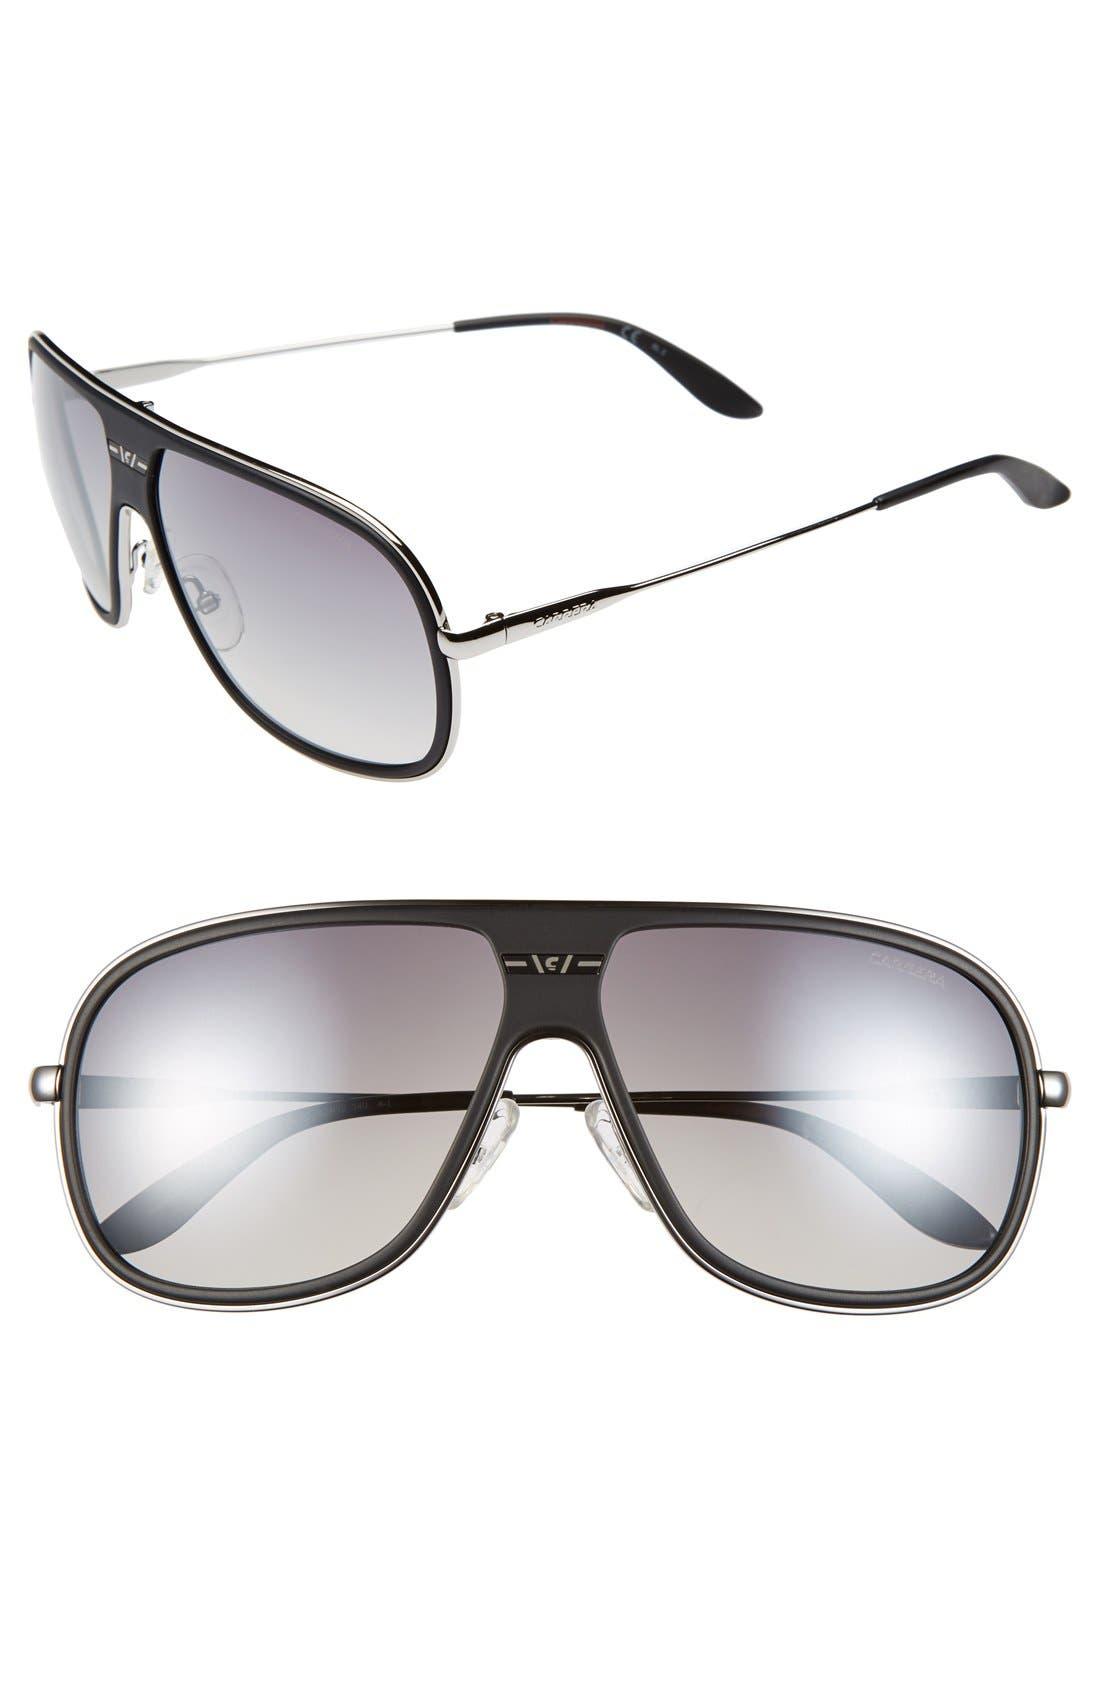 Main Image - Carrera Eyewear 62mm Retro Sunglasses